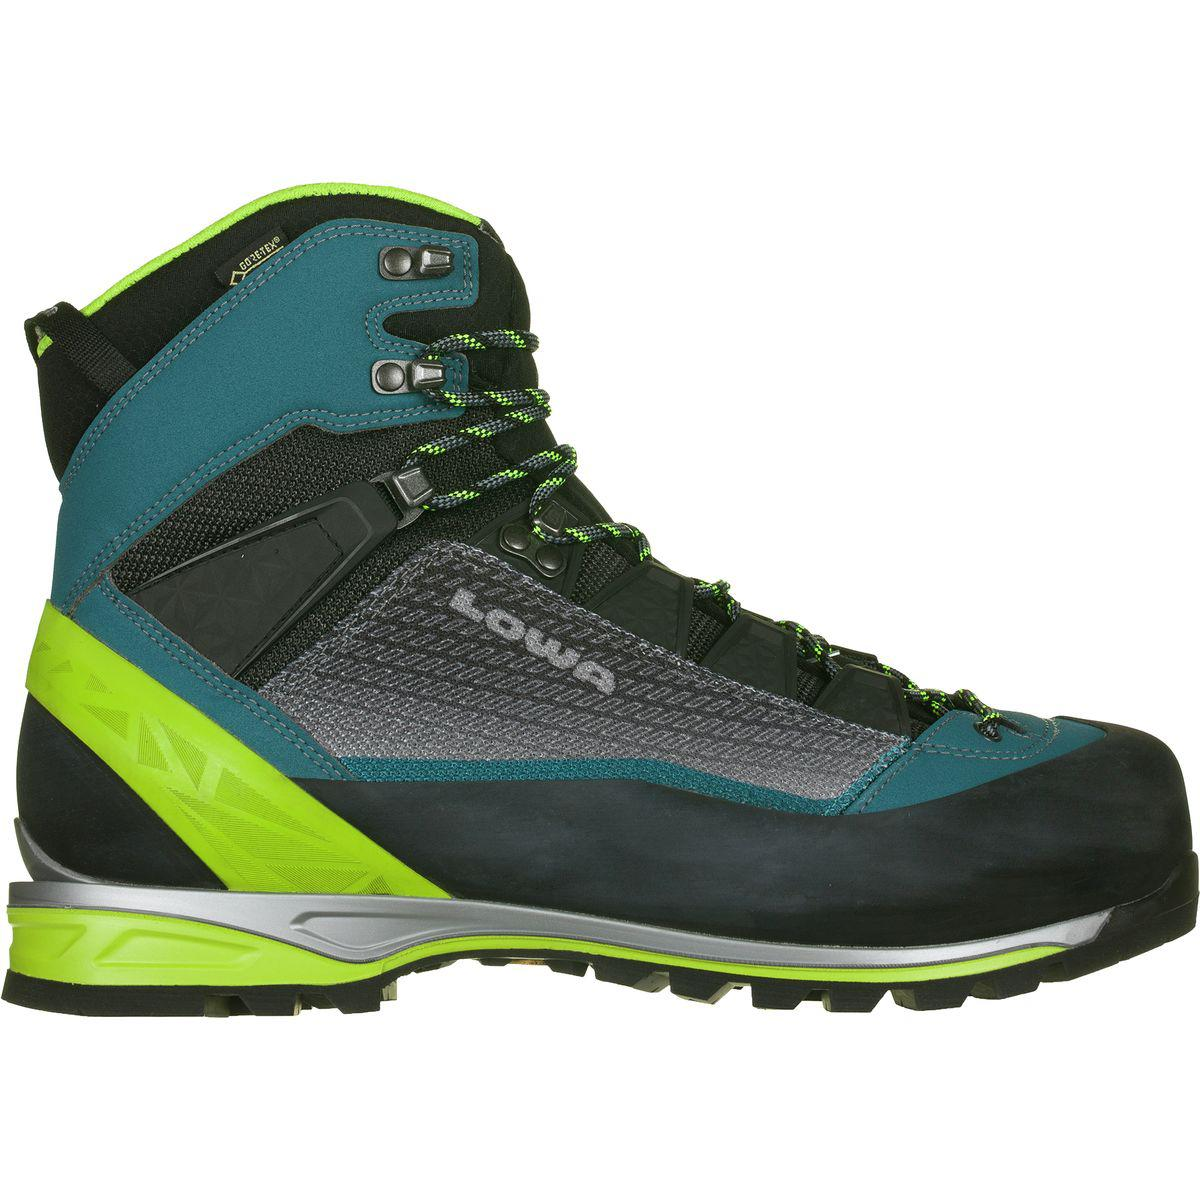 Lyst - Lowa Alpine Pro Gtx Mountaineering Boot in Green